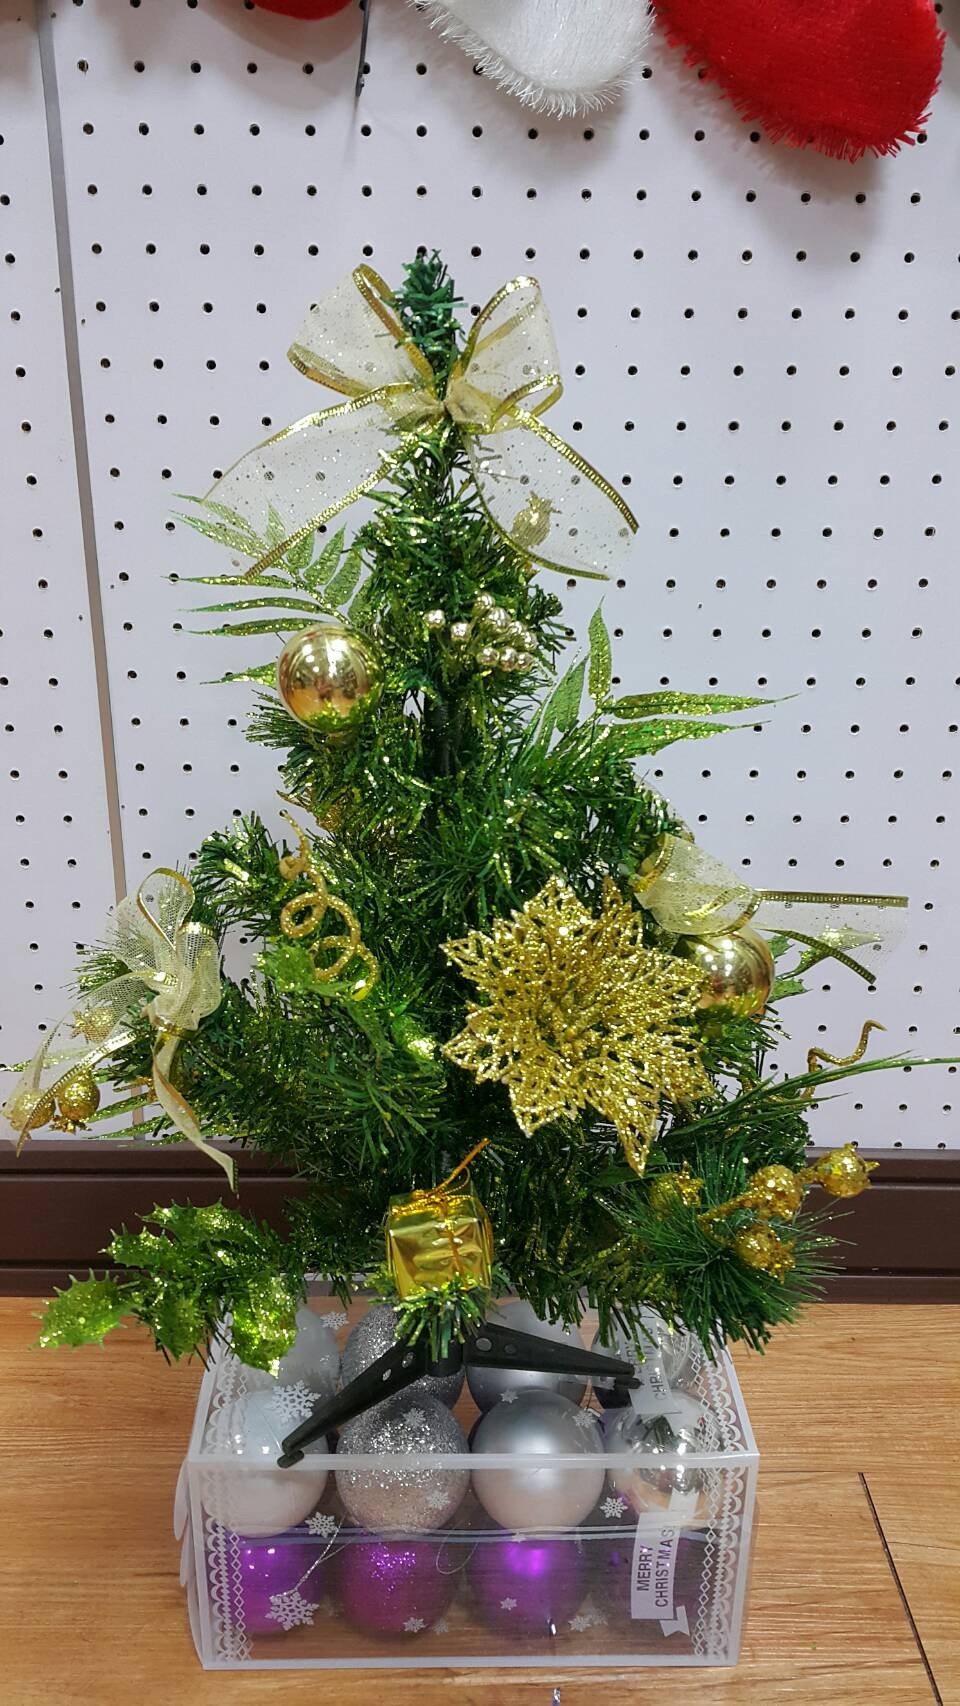 X射線【X454066】40cm裝飾聖誕樹(金),聖誕樹/聖誕佈置/聖誕燈/會場佈置/材料包/成品樹/小樹